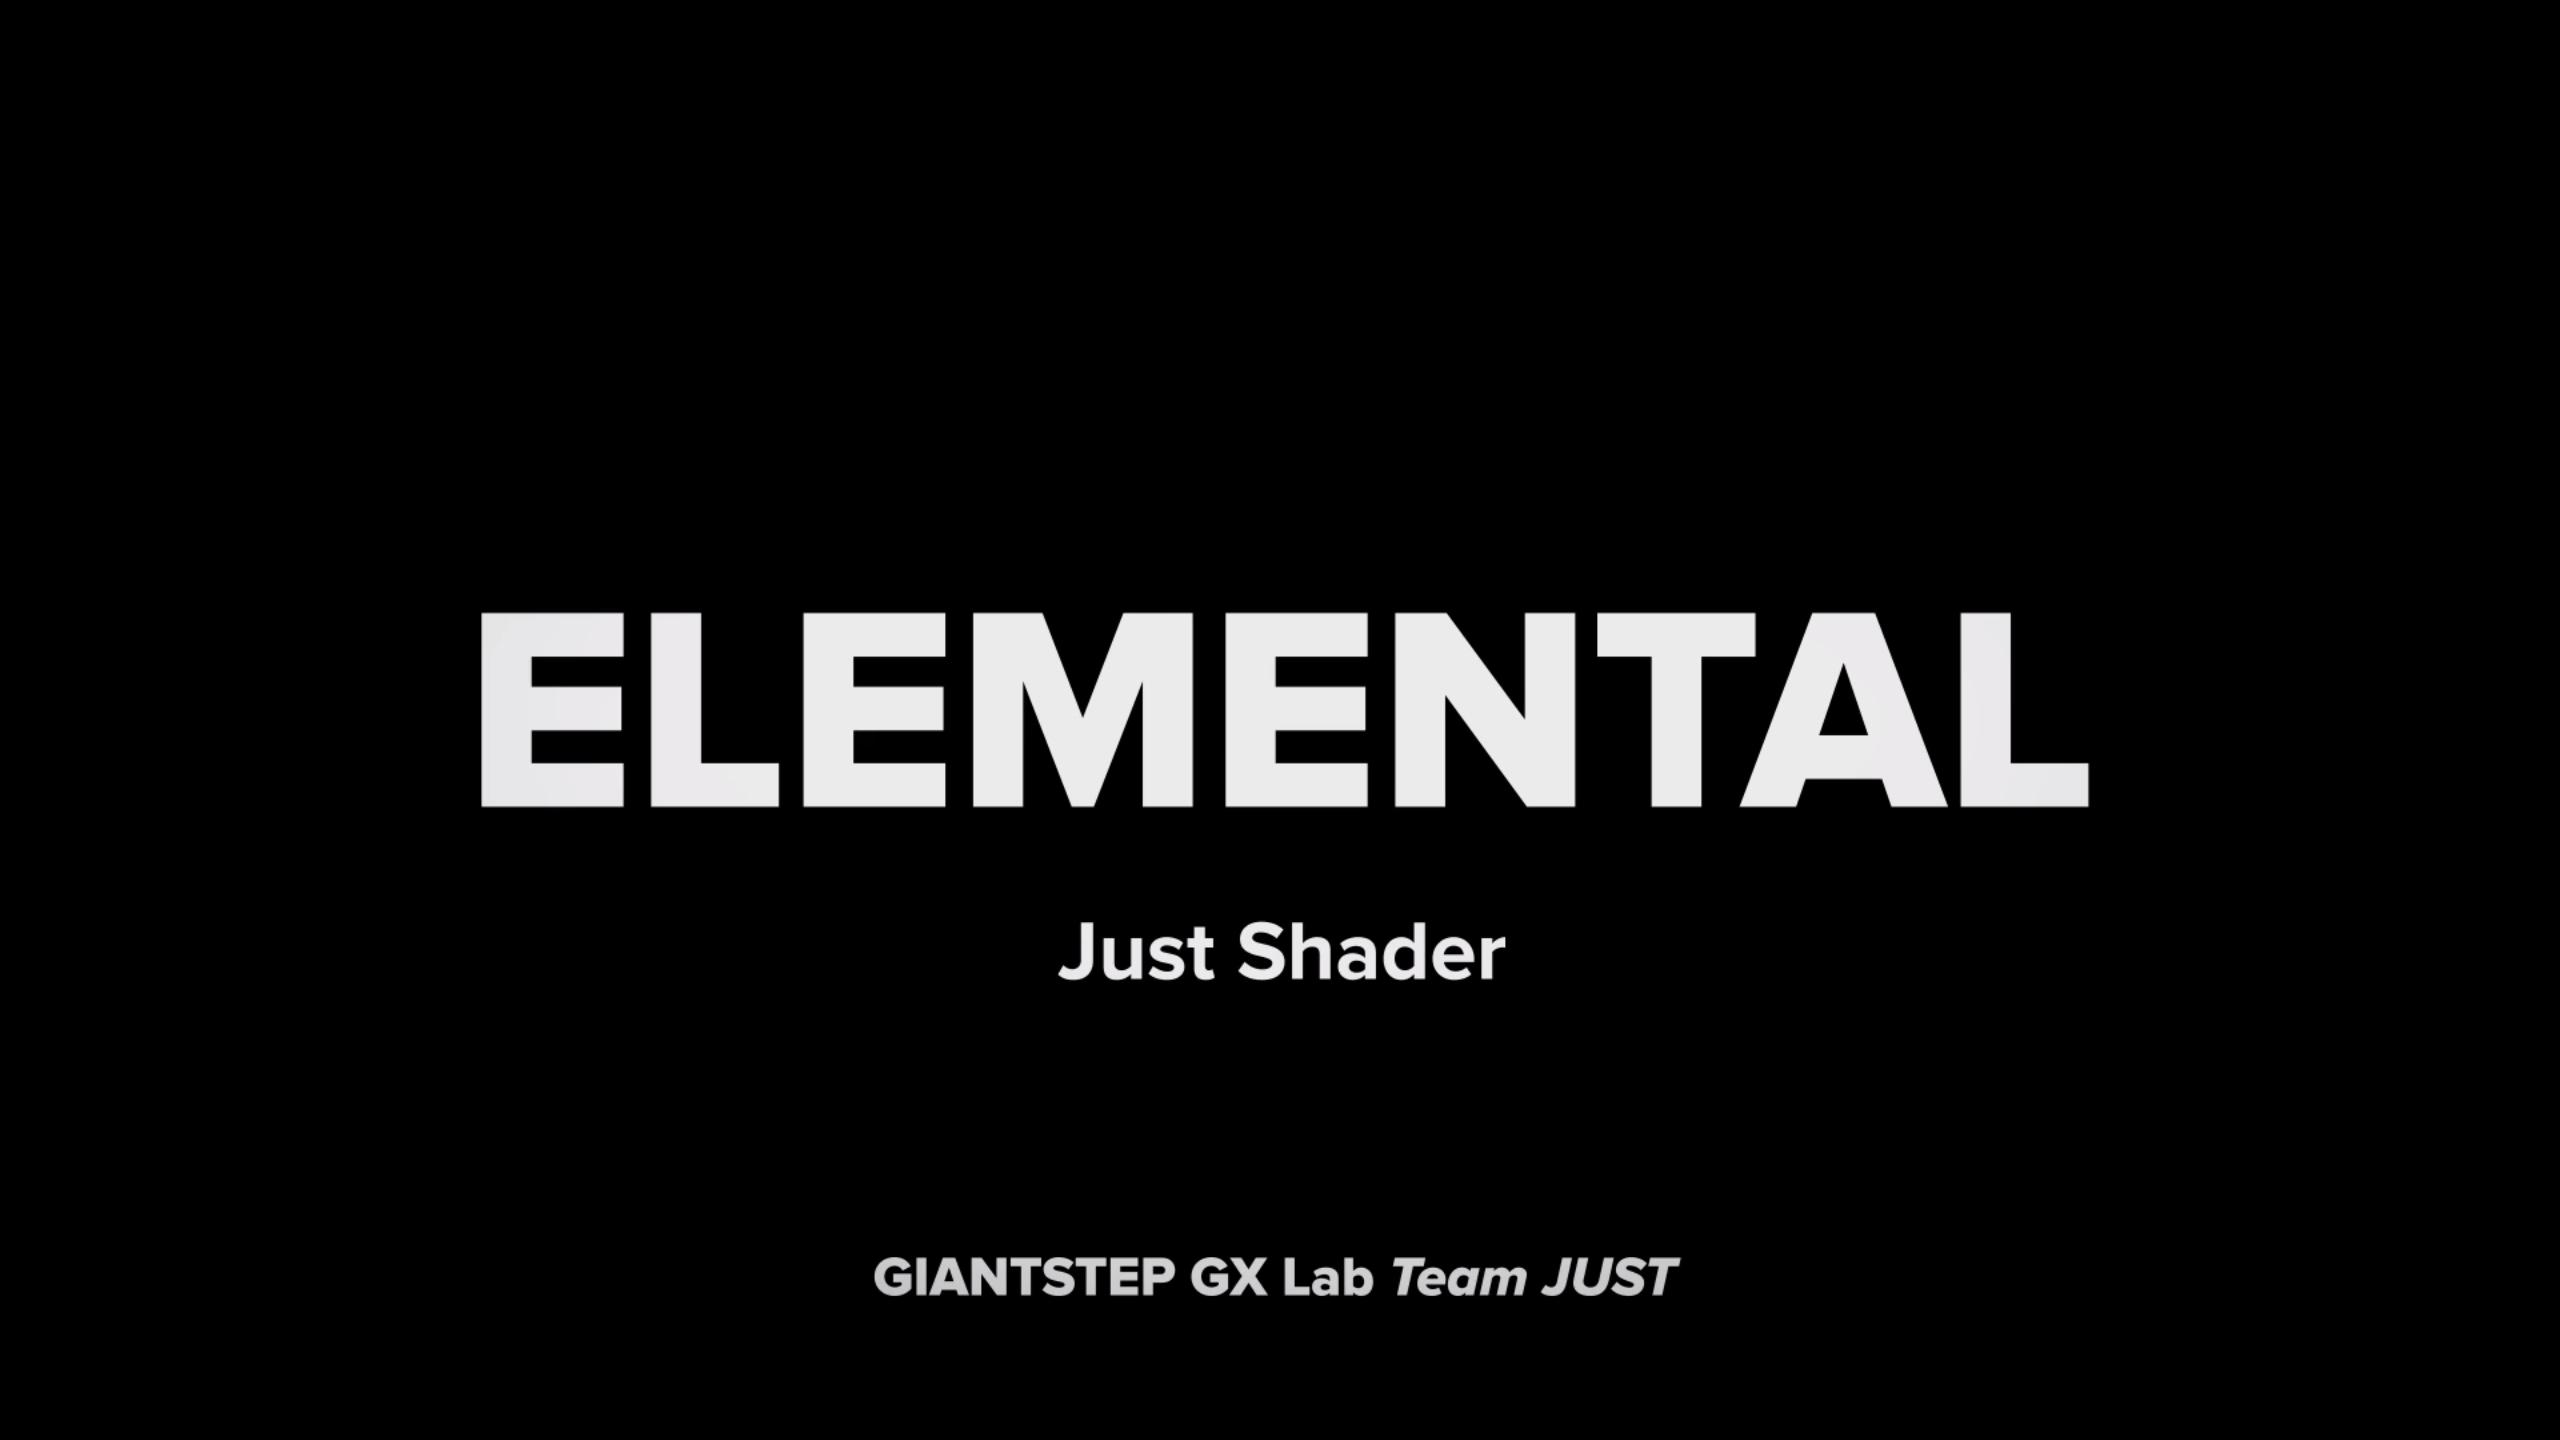 Just Shader 4th - Elemental